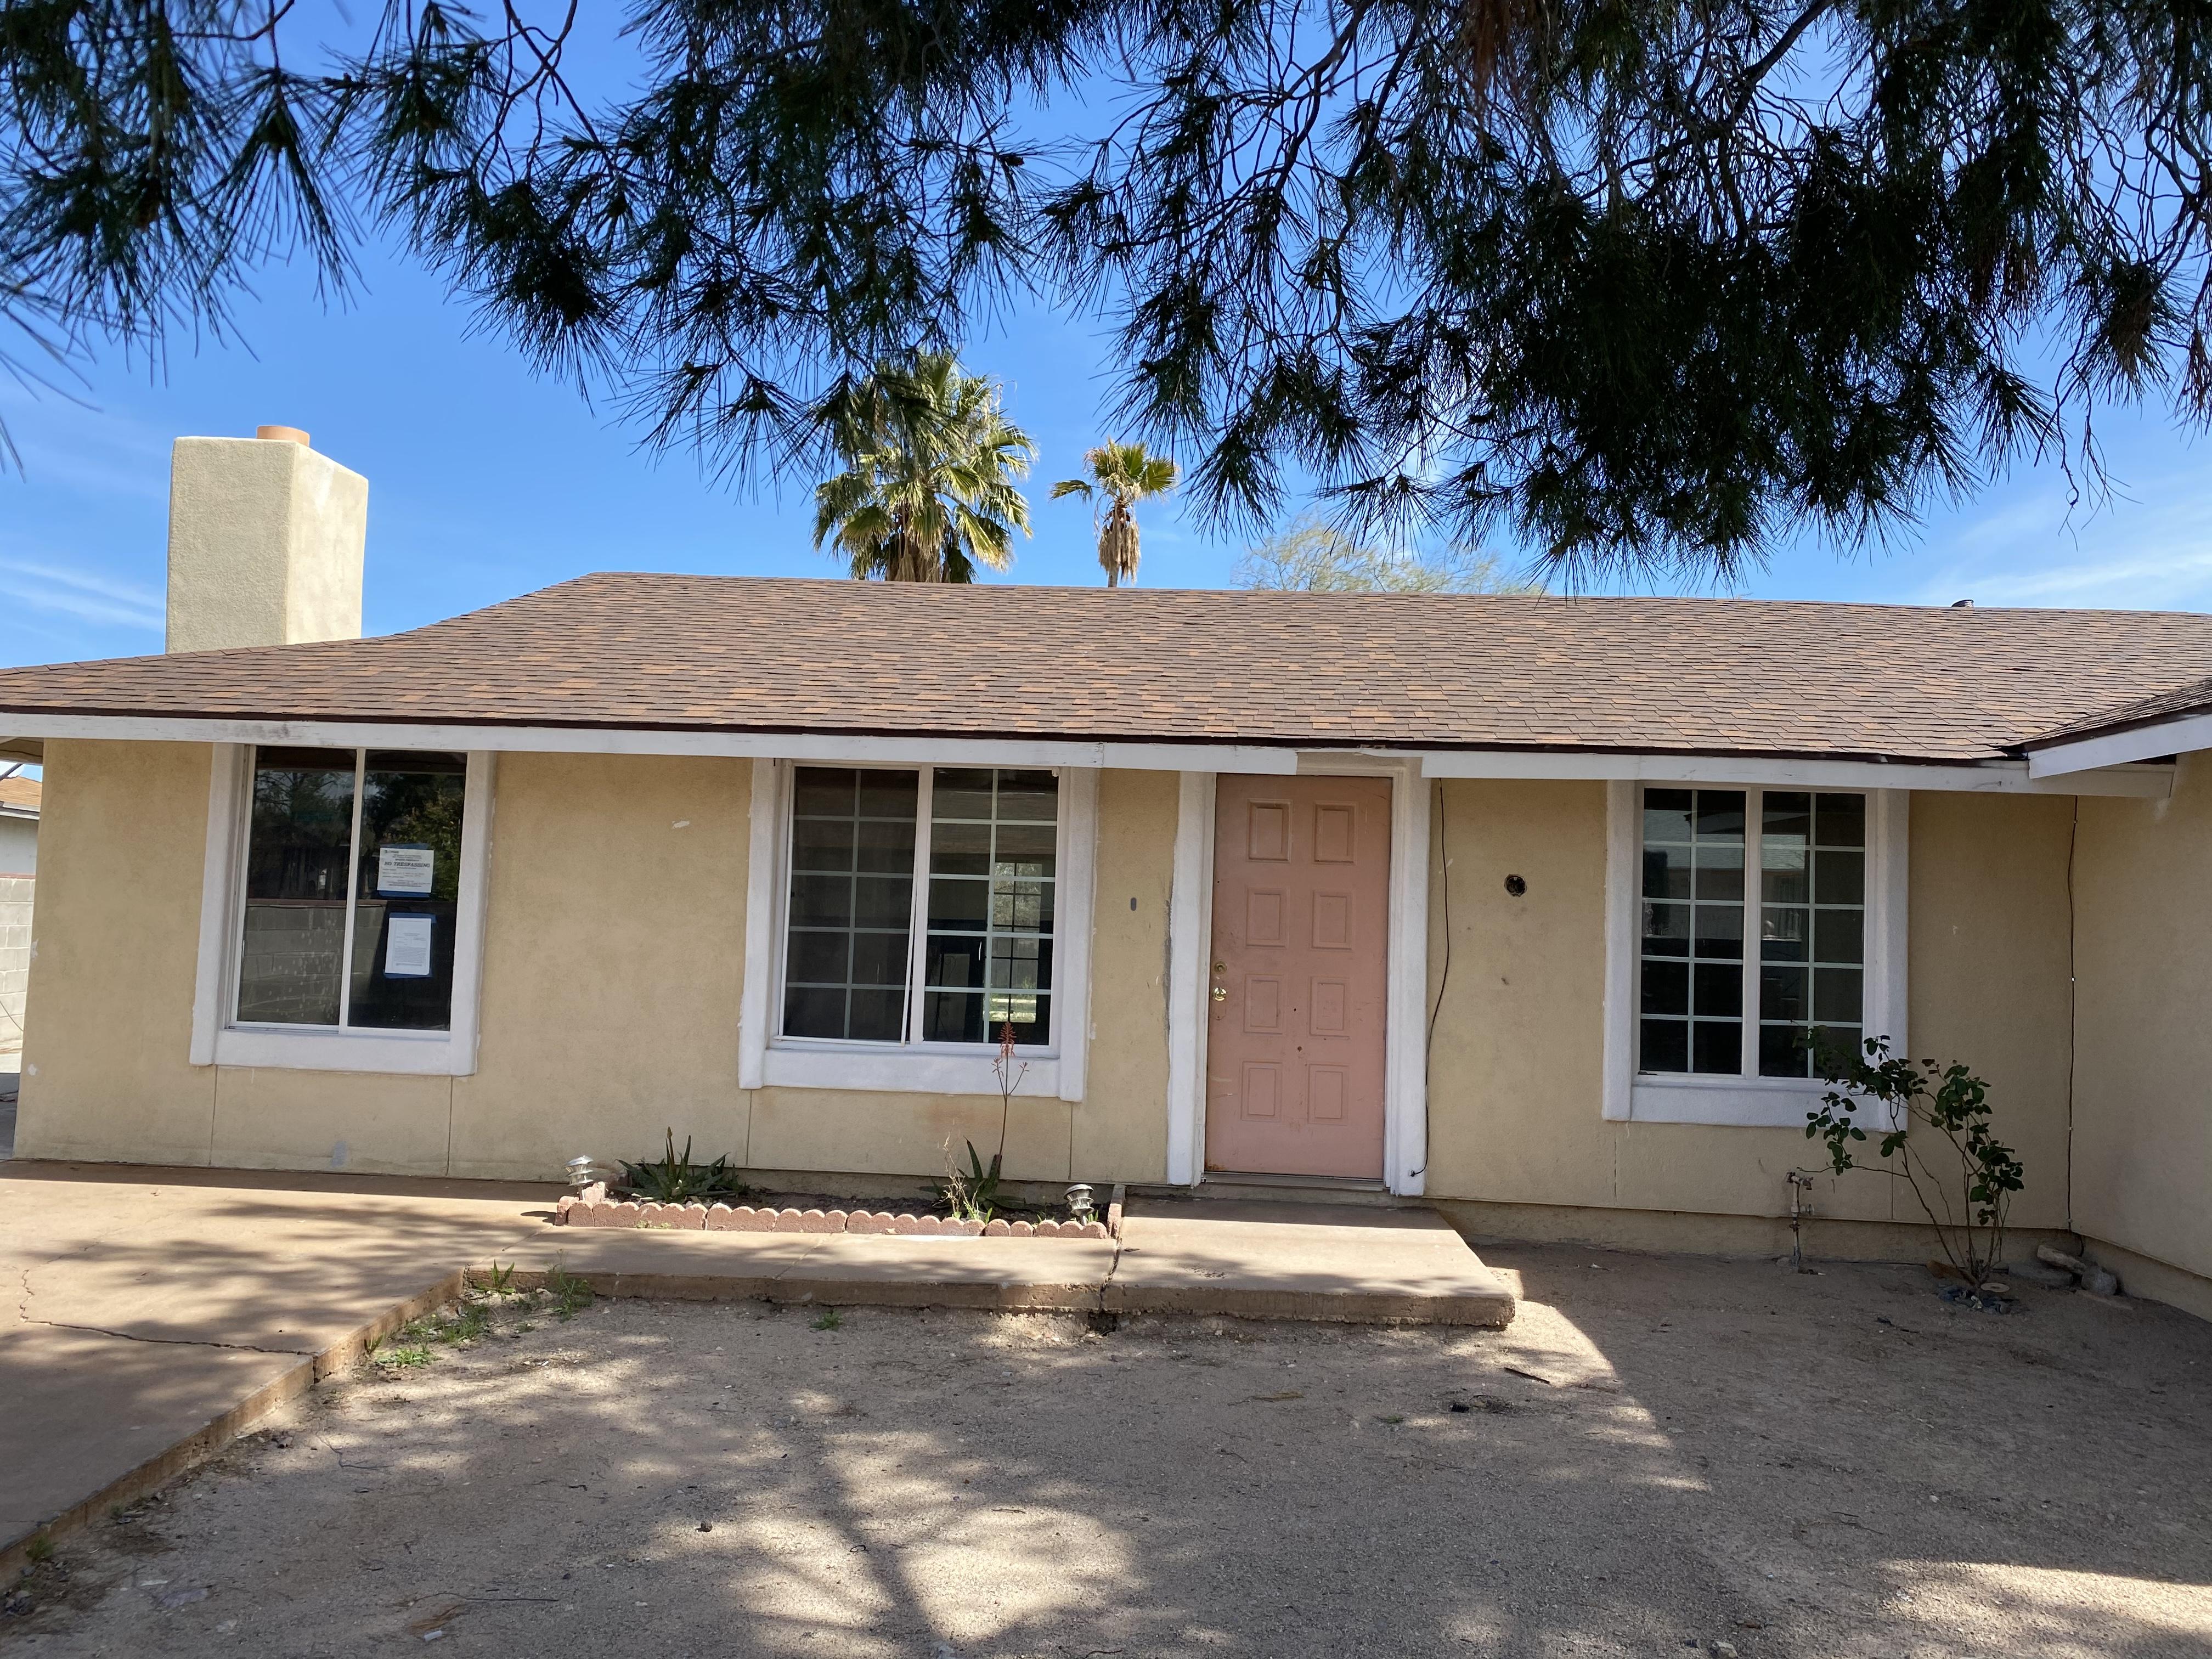 Online Auction: Single Family Home 6621 S. Vereda De Las Casitas In Tucson, AZ